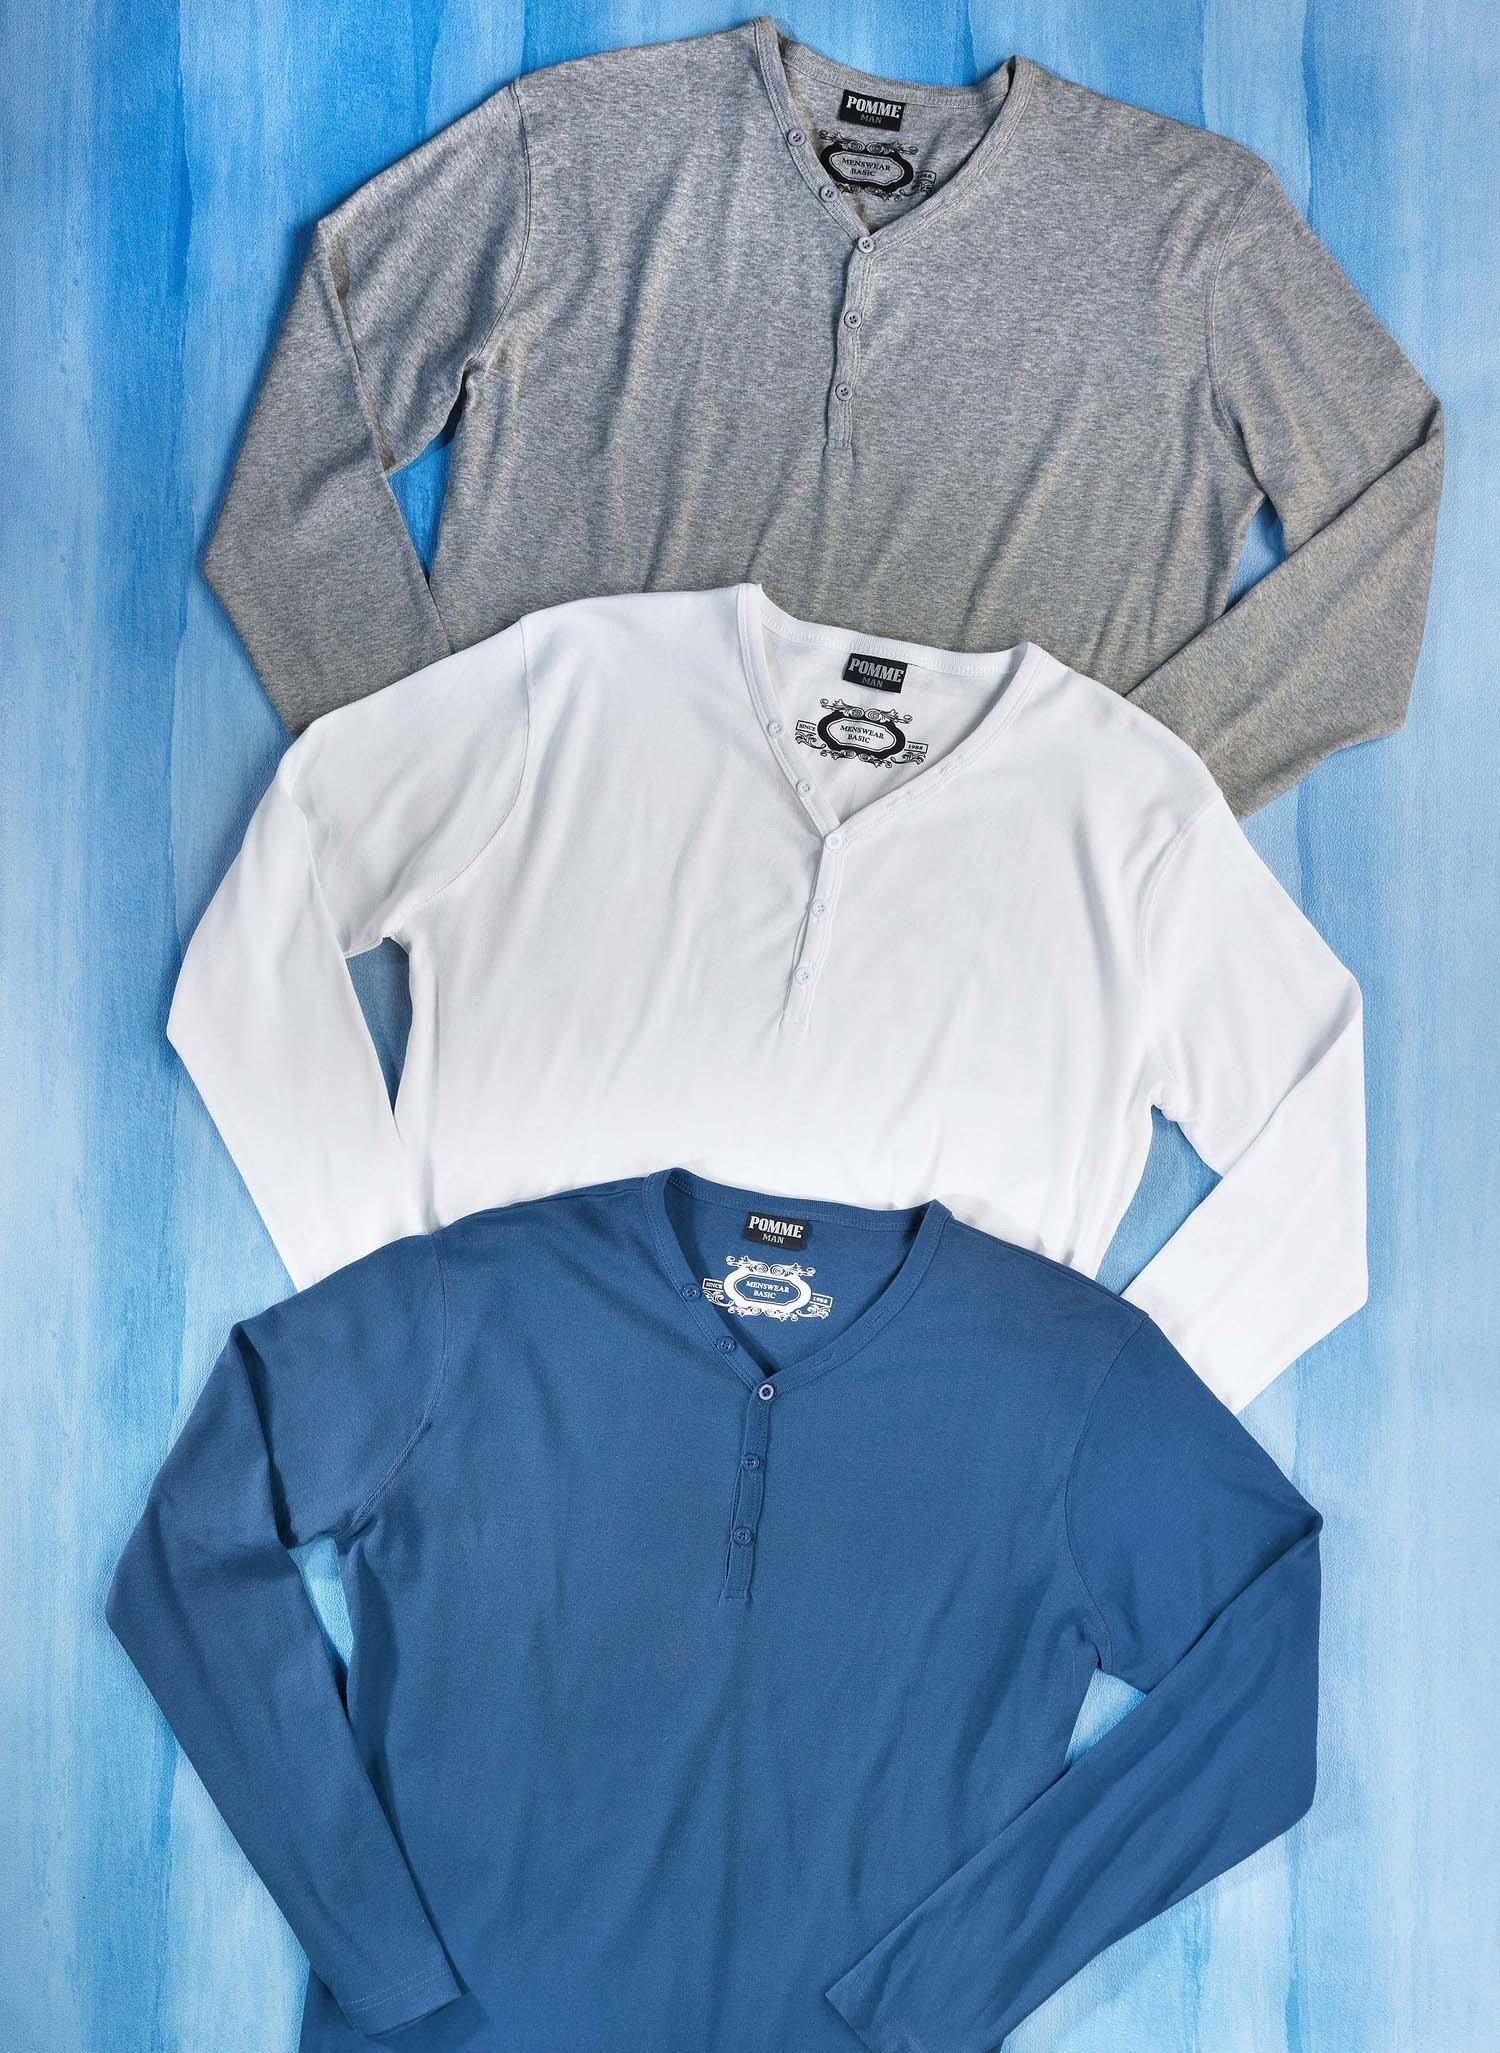 H-LA-Shirt,Knopfleiste grau m. L 004 - 2 - Ronja.ch